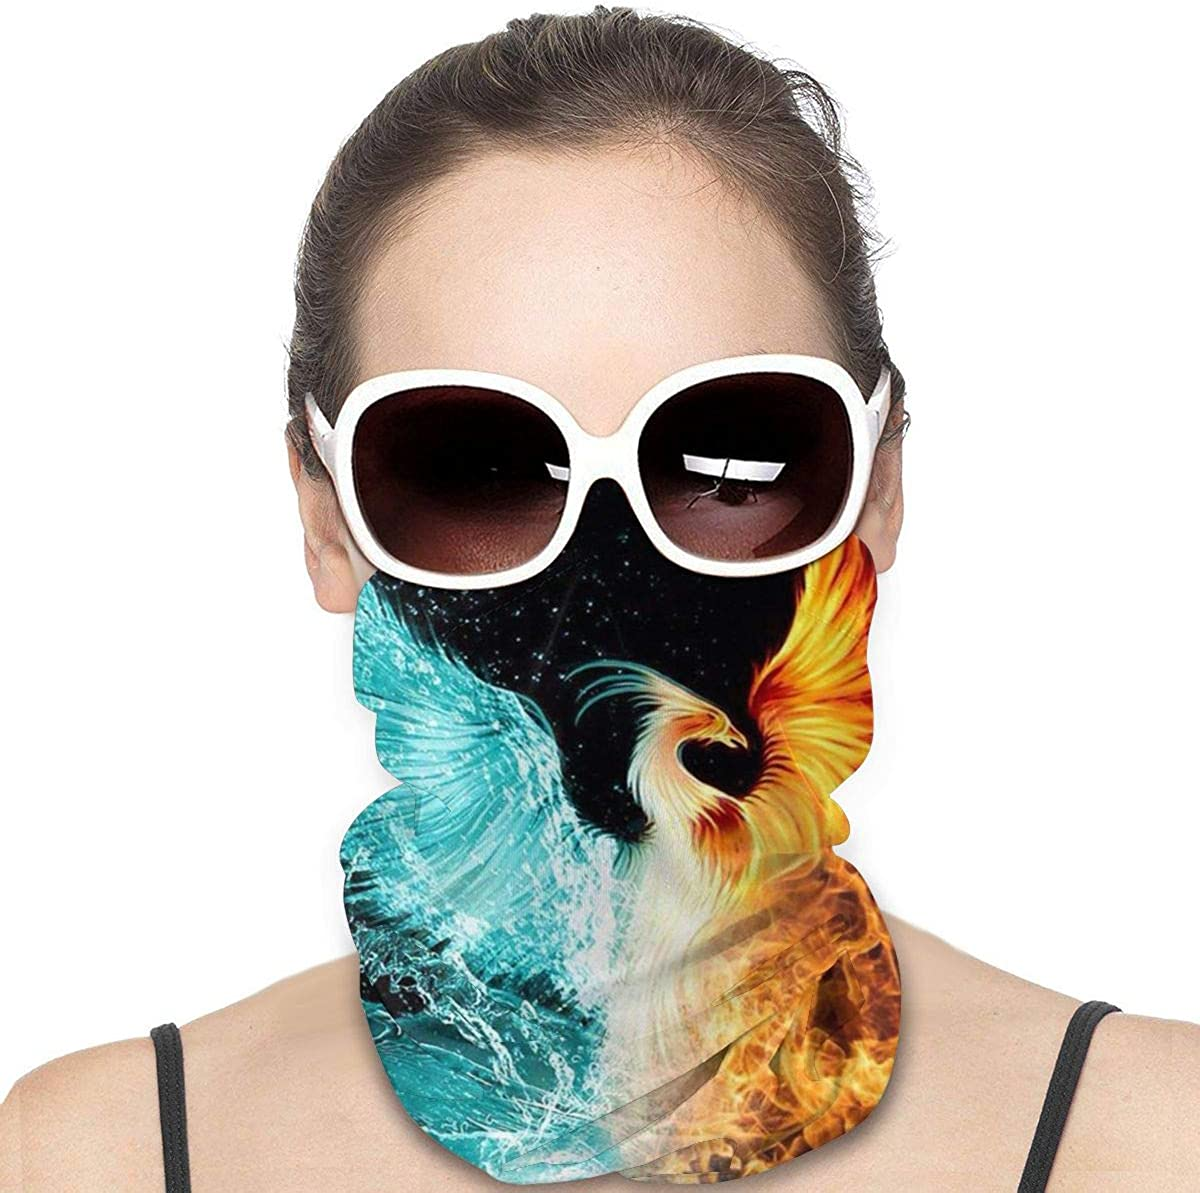 JinSPef Bandana Face Mask - Fire Water Phoenix Golden Red Burning Birds Motorcycle Mask Ski Mask Face Scarf Head Bands Neck Warmer Men Headbands Face Mask Bandana